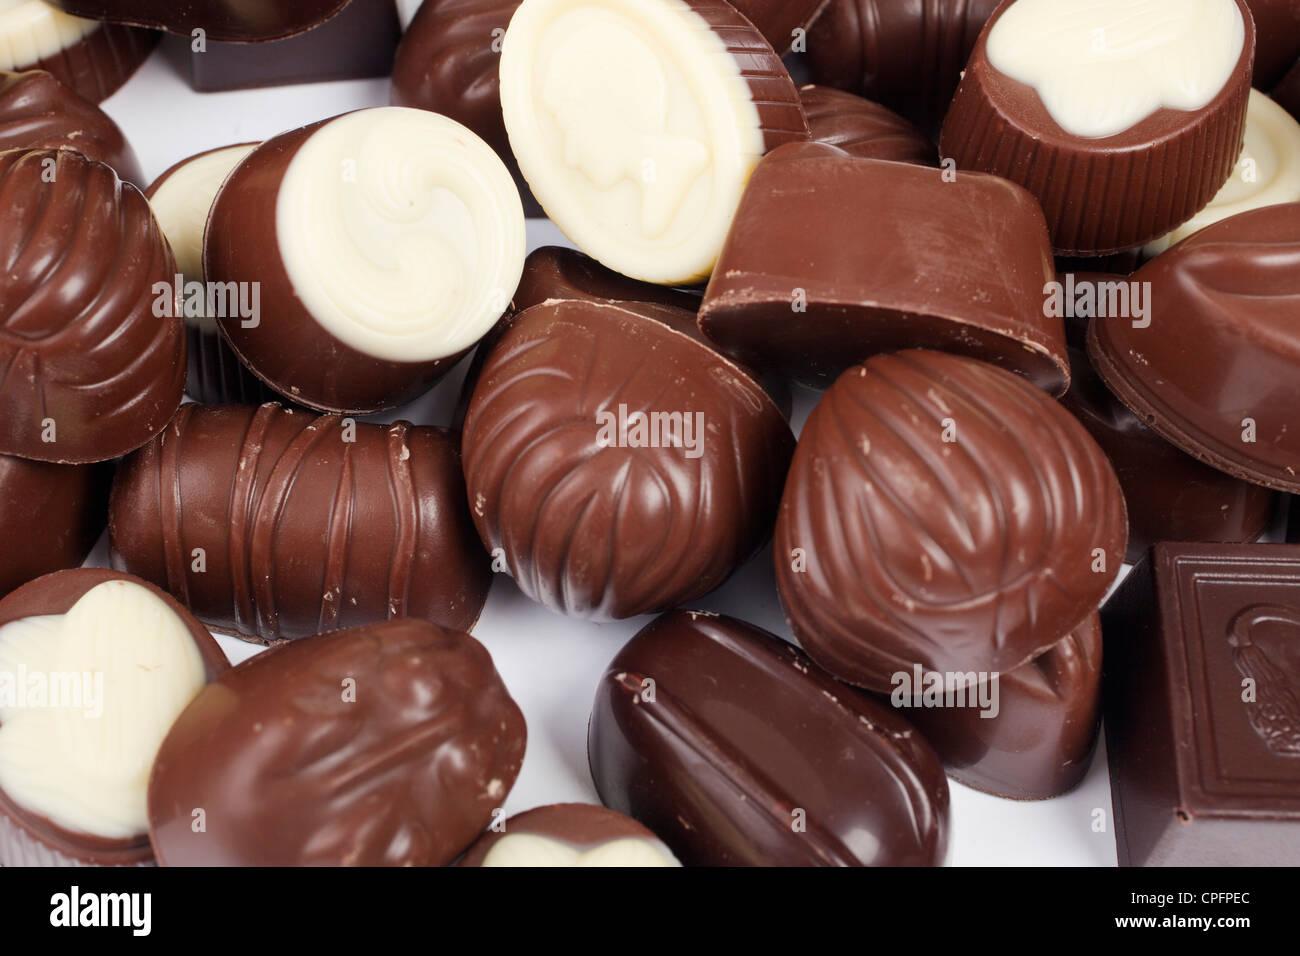 Chocolate bonbons - Stock Image